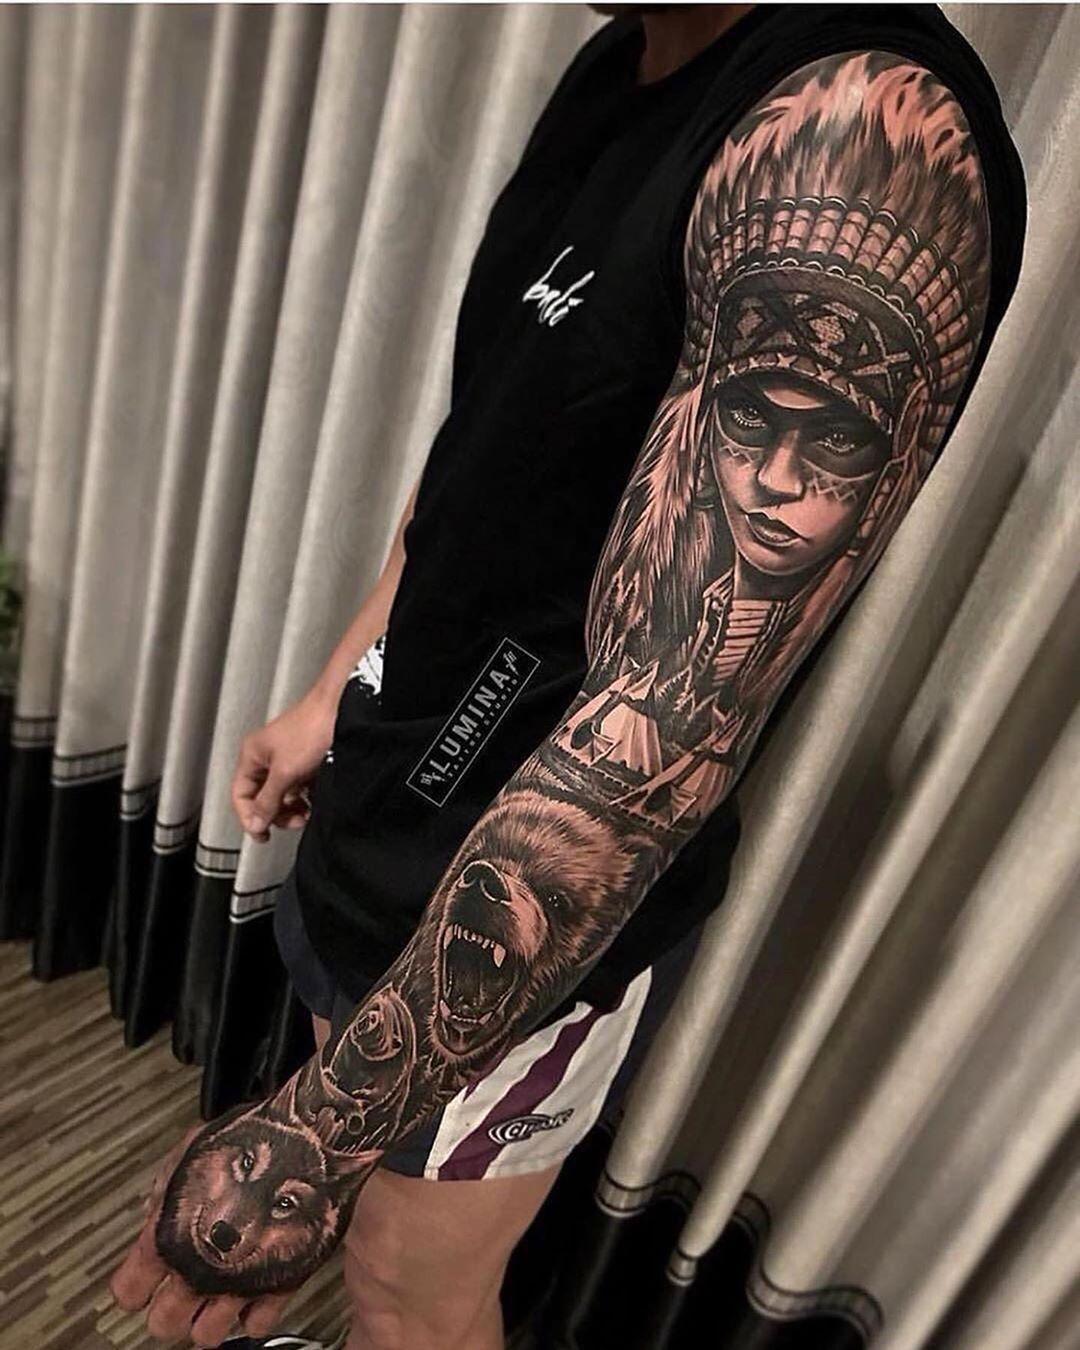 Tattoos In 2020 Sleeve Tattoos Native American Tattoo Sleeve Native Tattoos